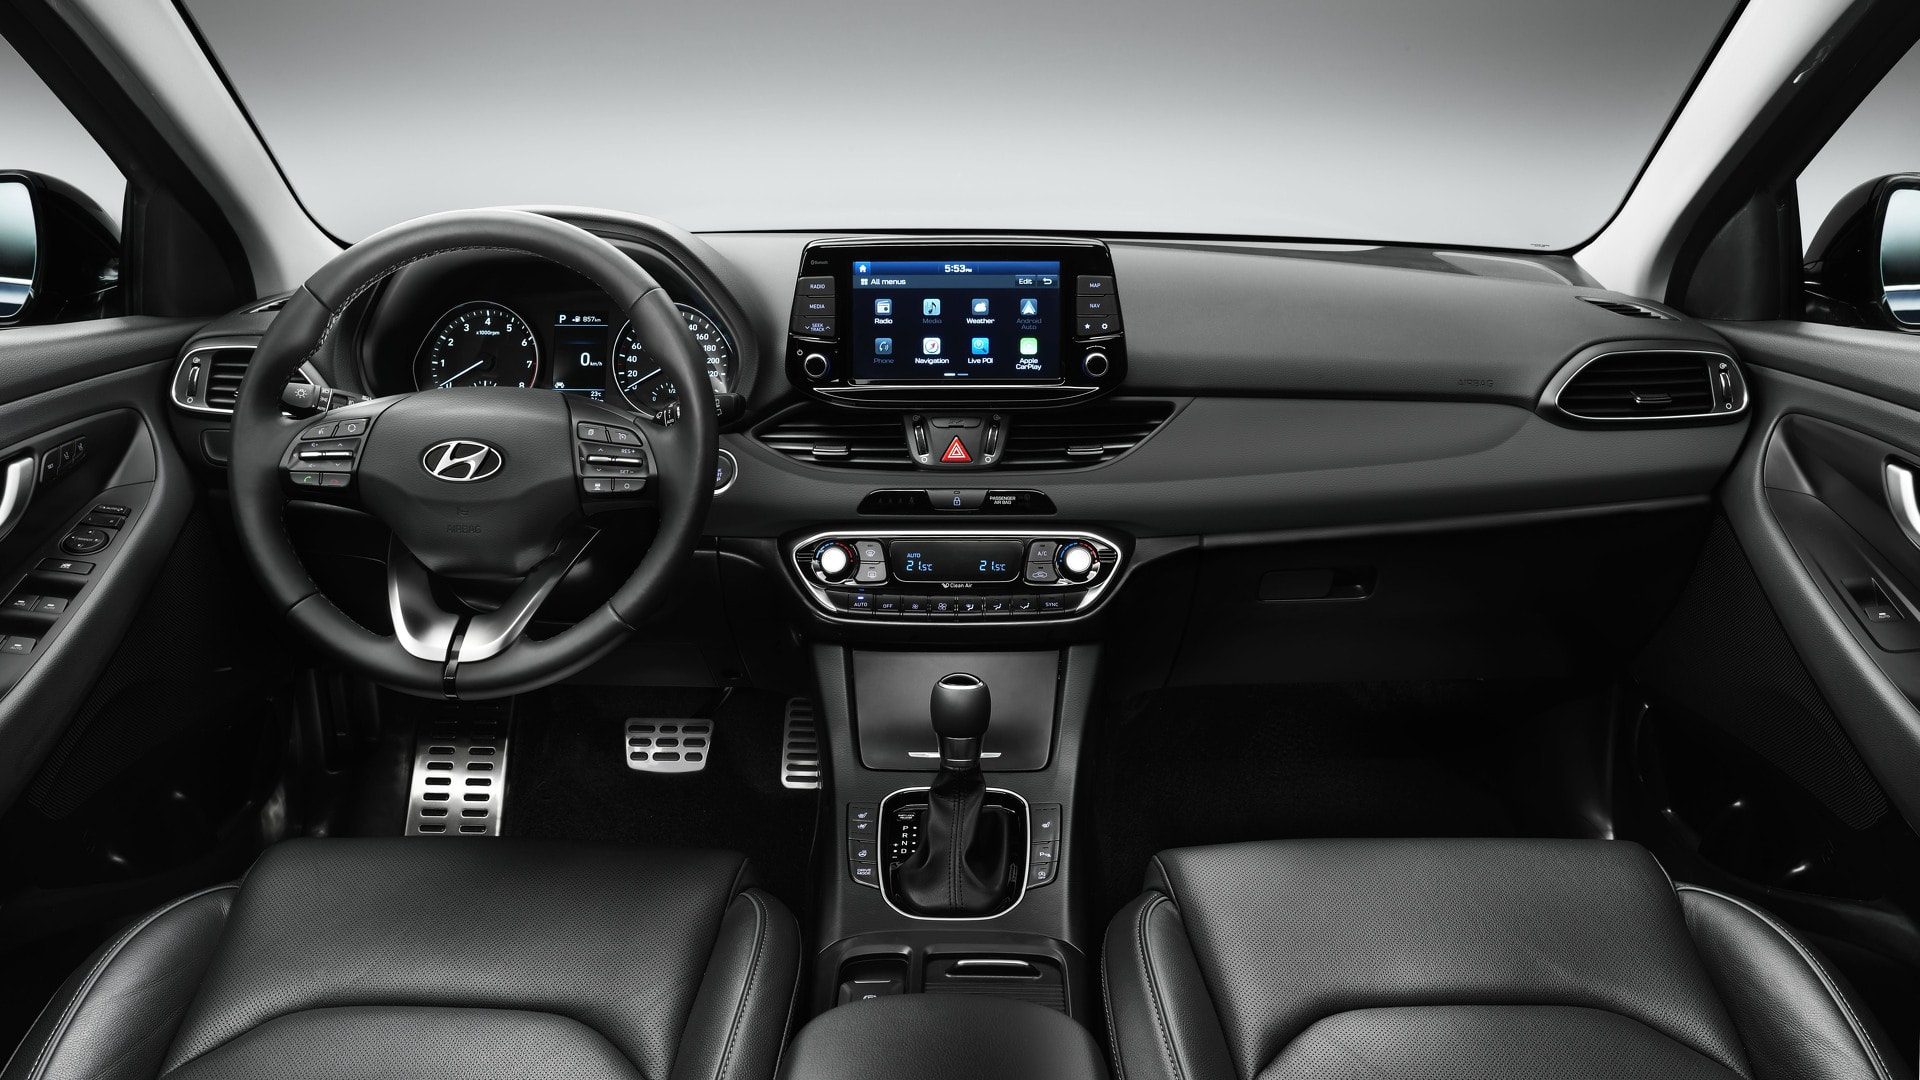 Hyundai i30 III Wallpapers hd